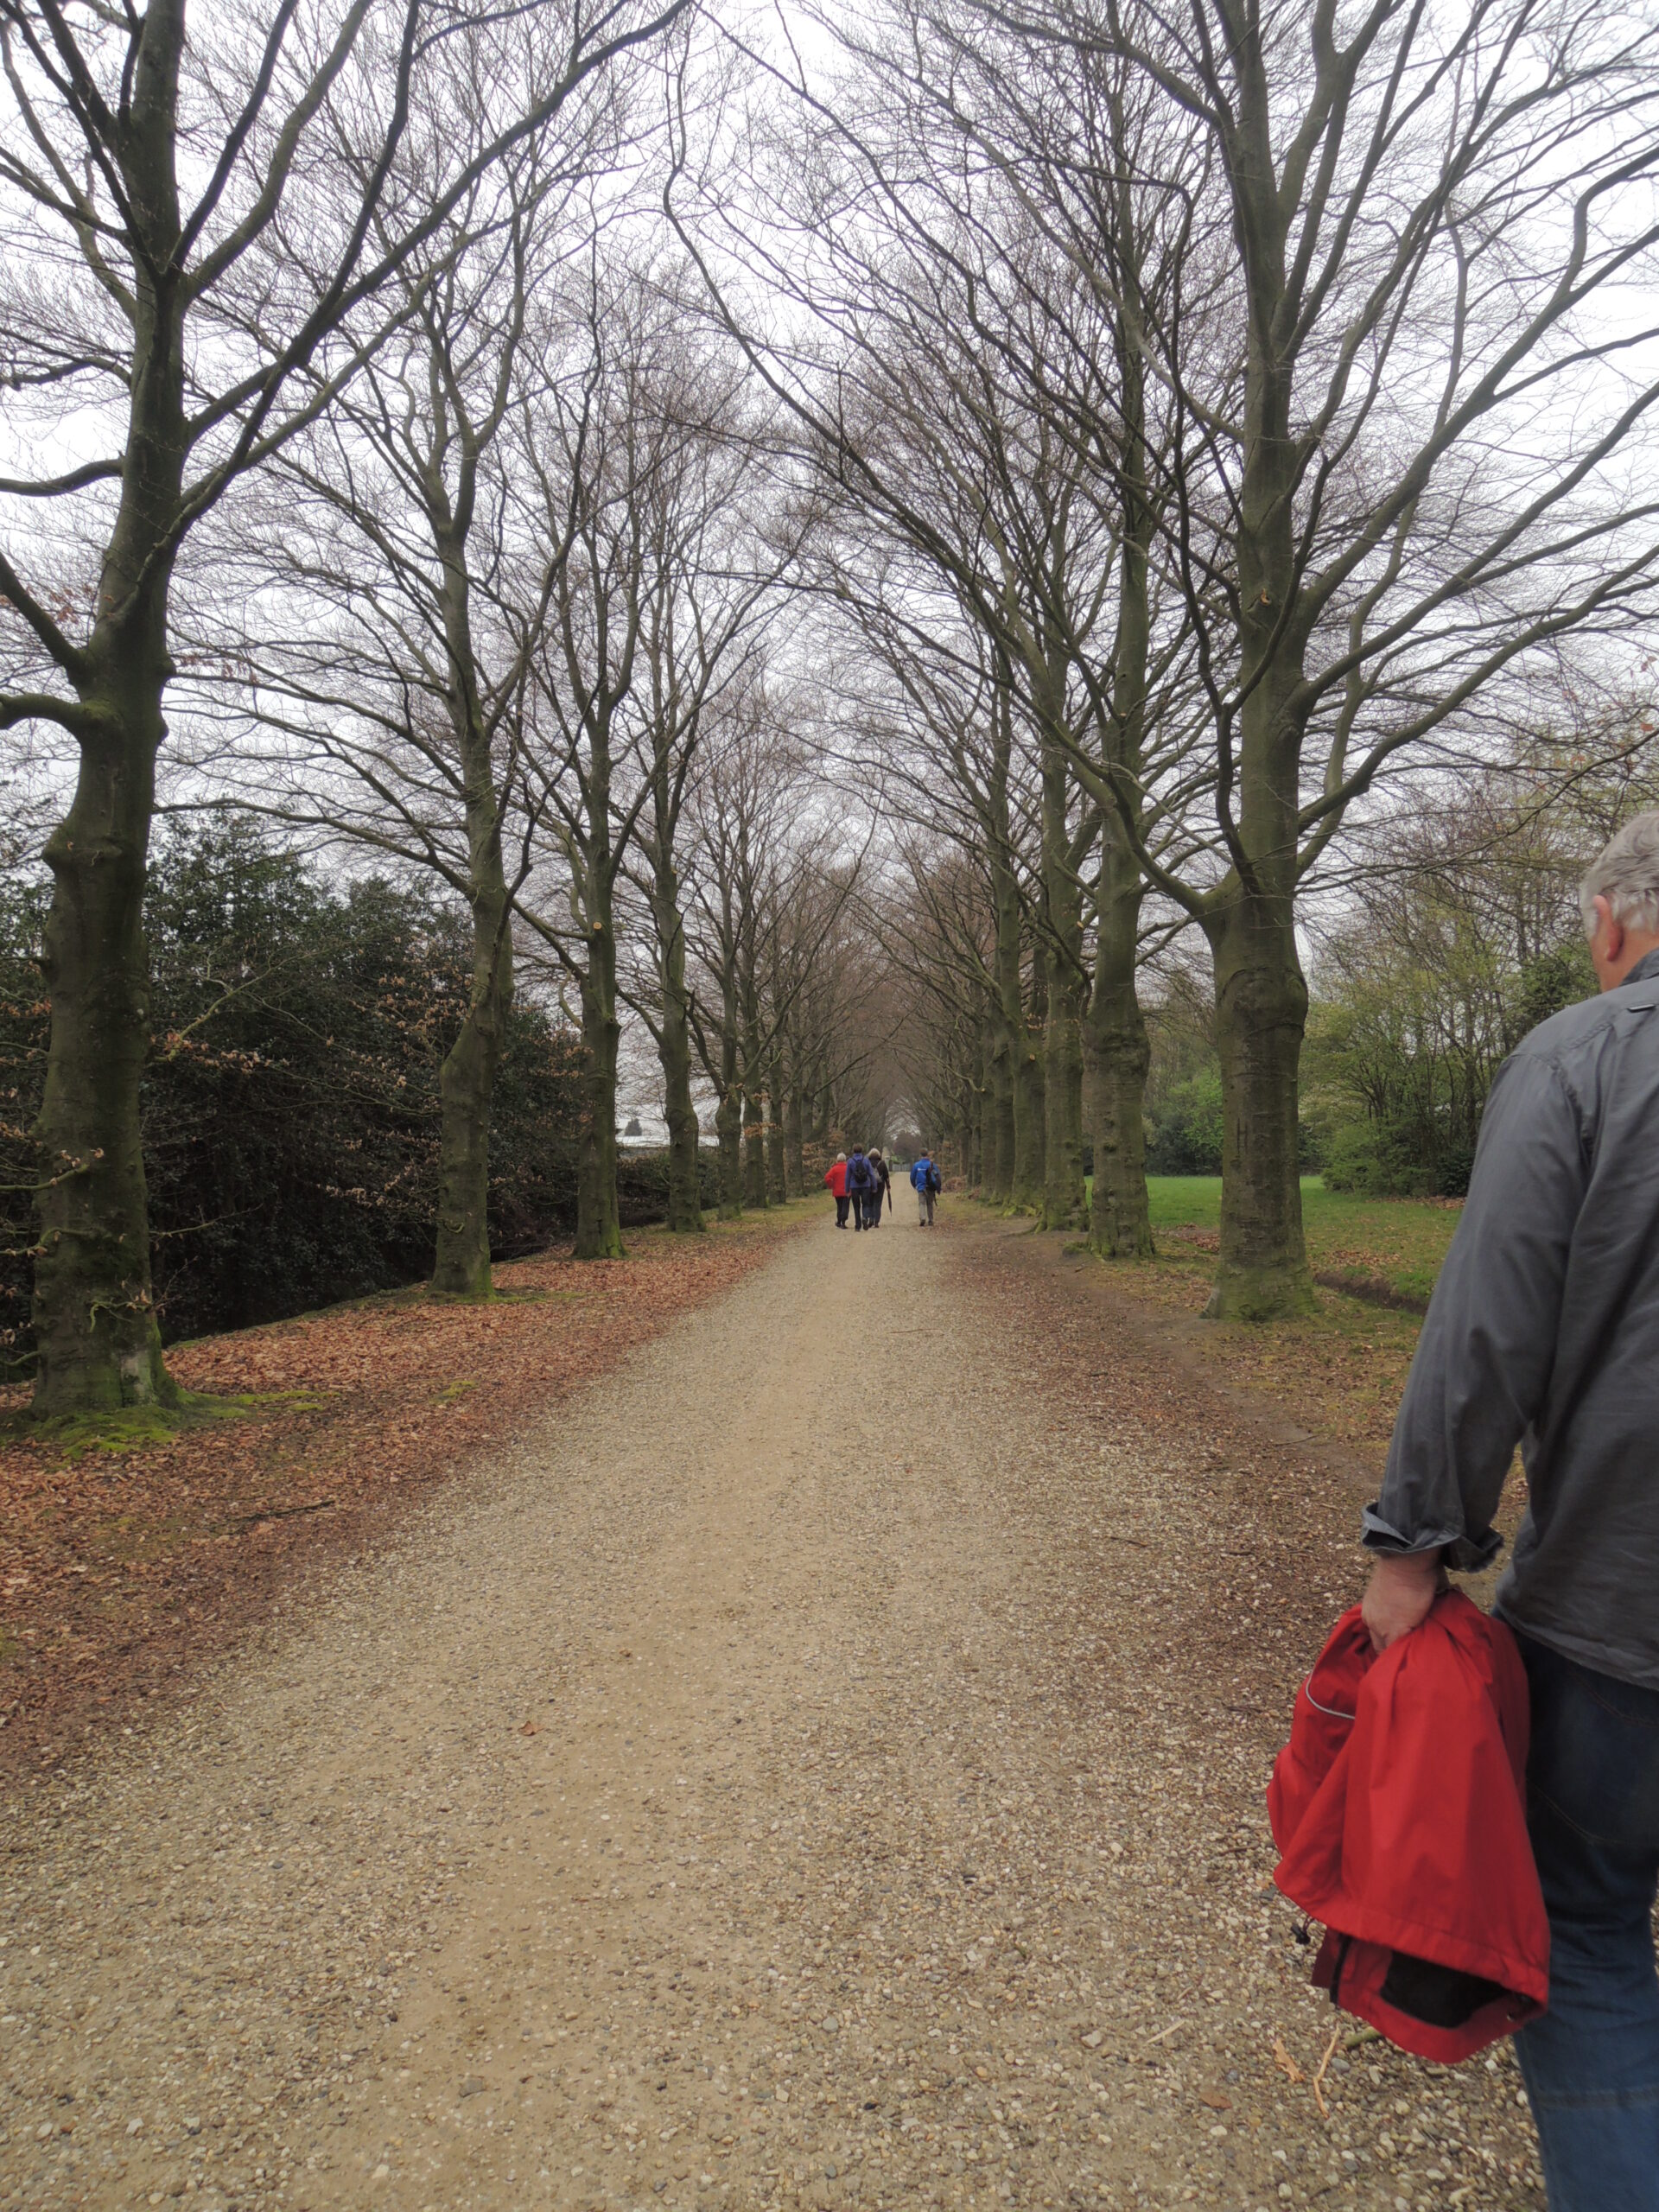 wandelgroep het kristal, april 2014